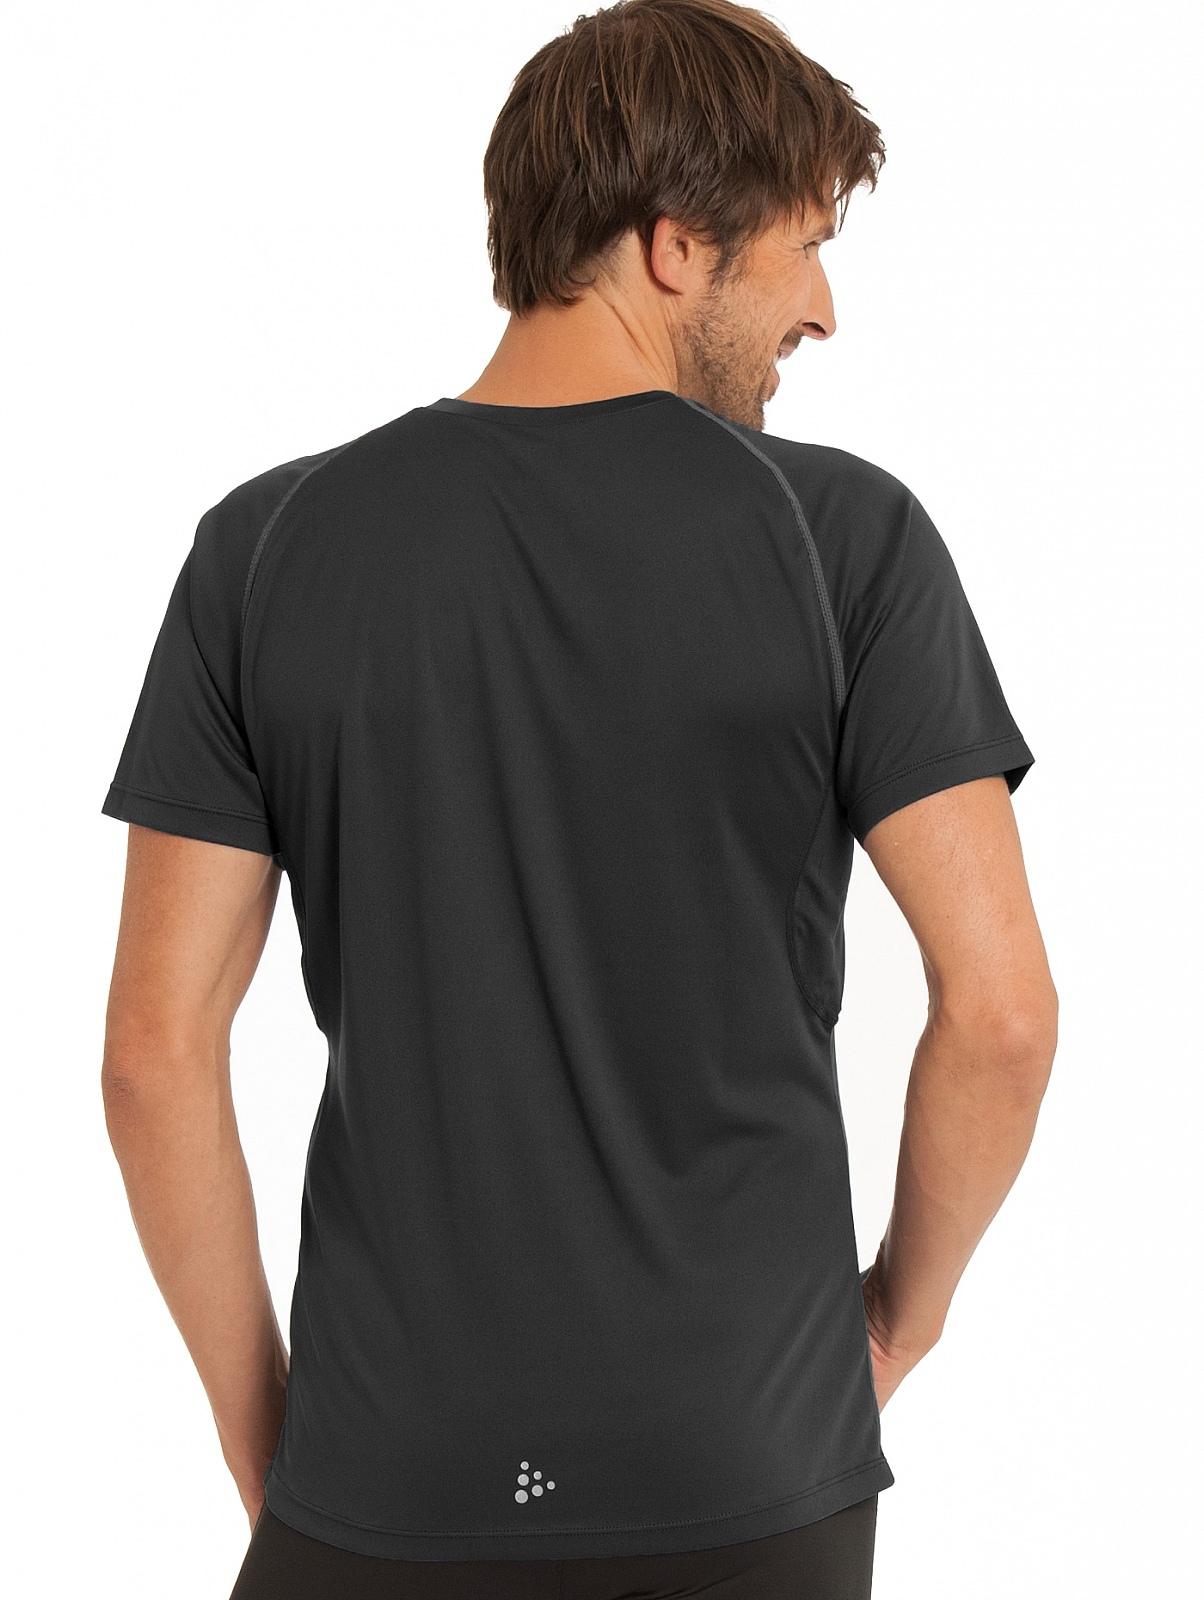 Мужская беговая футболка Craft Prime Run (1902497-9999) черная фото